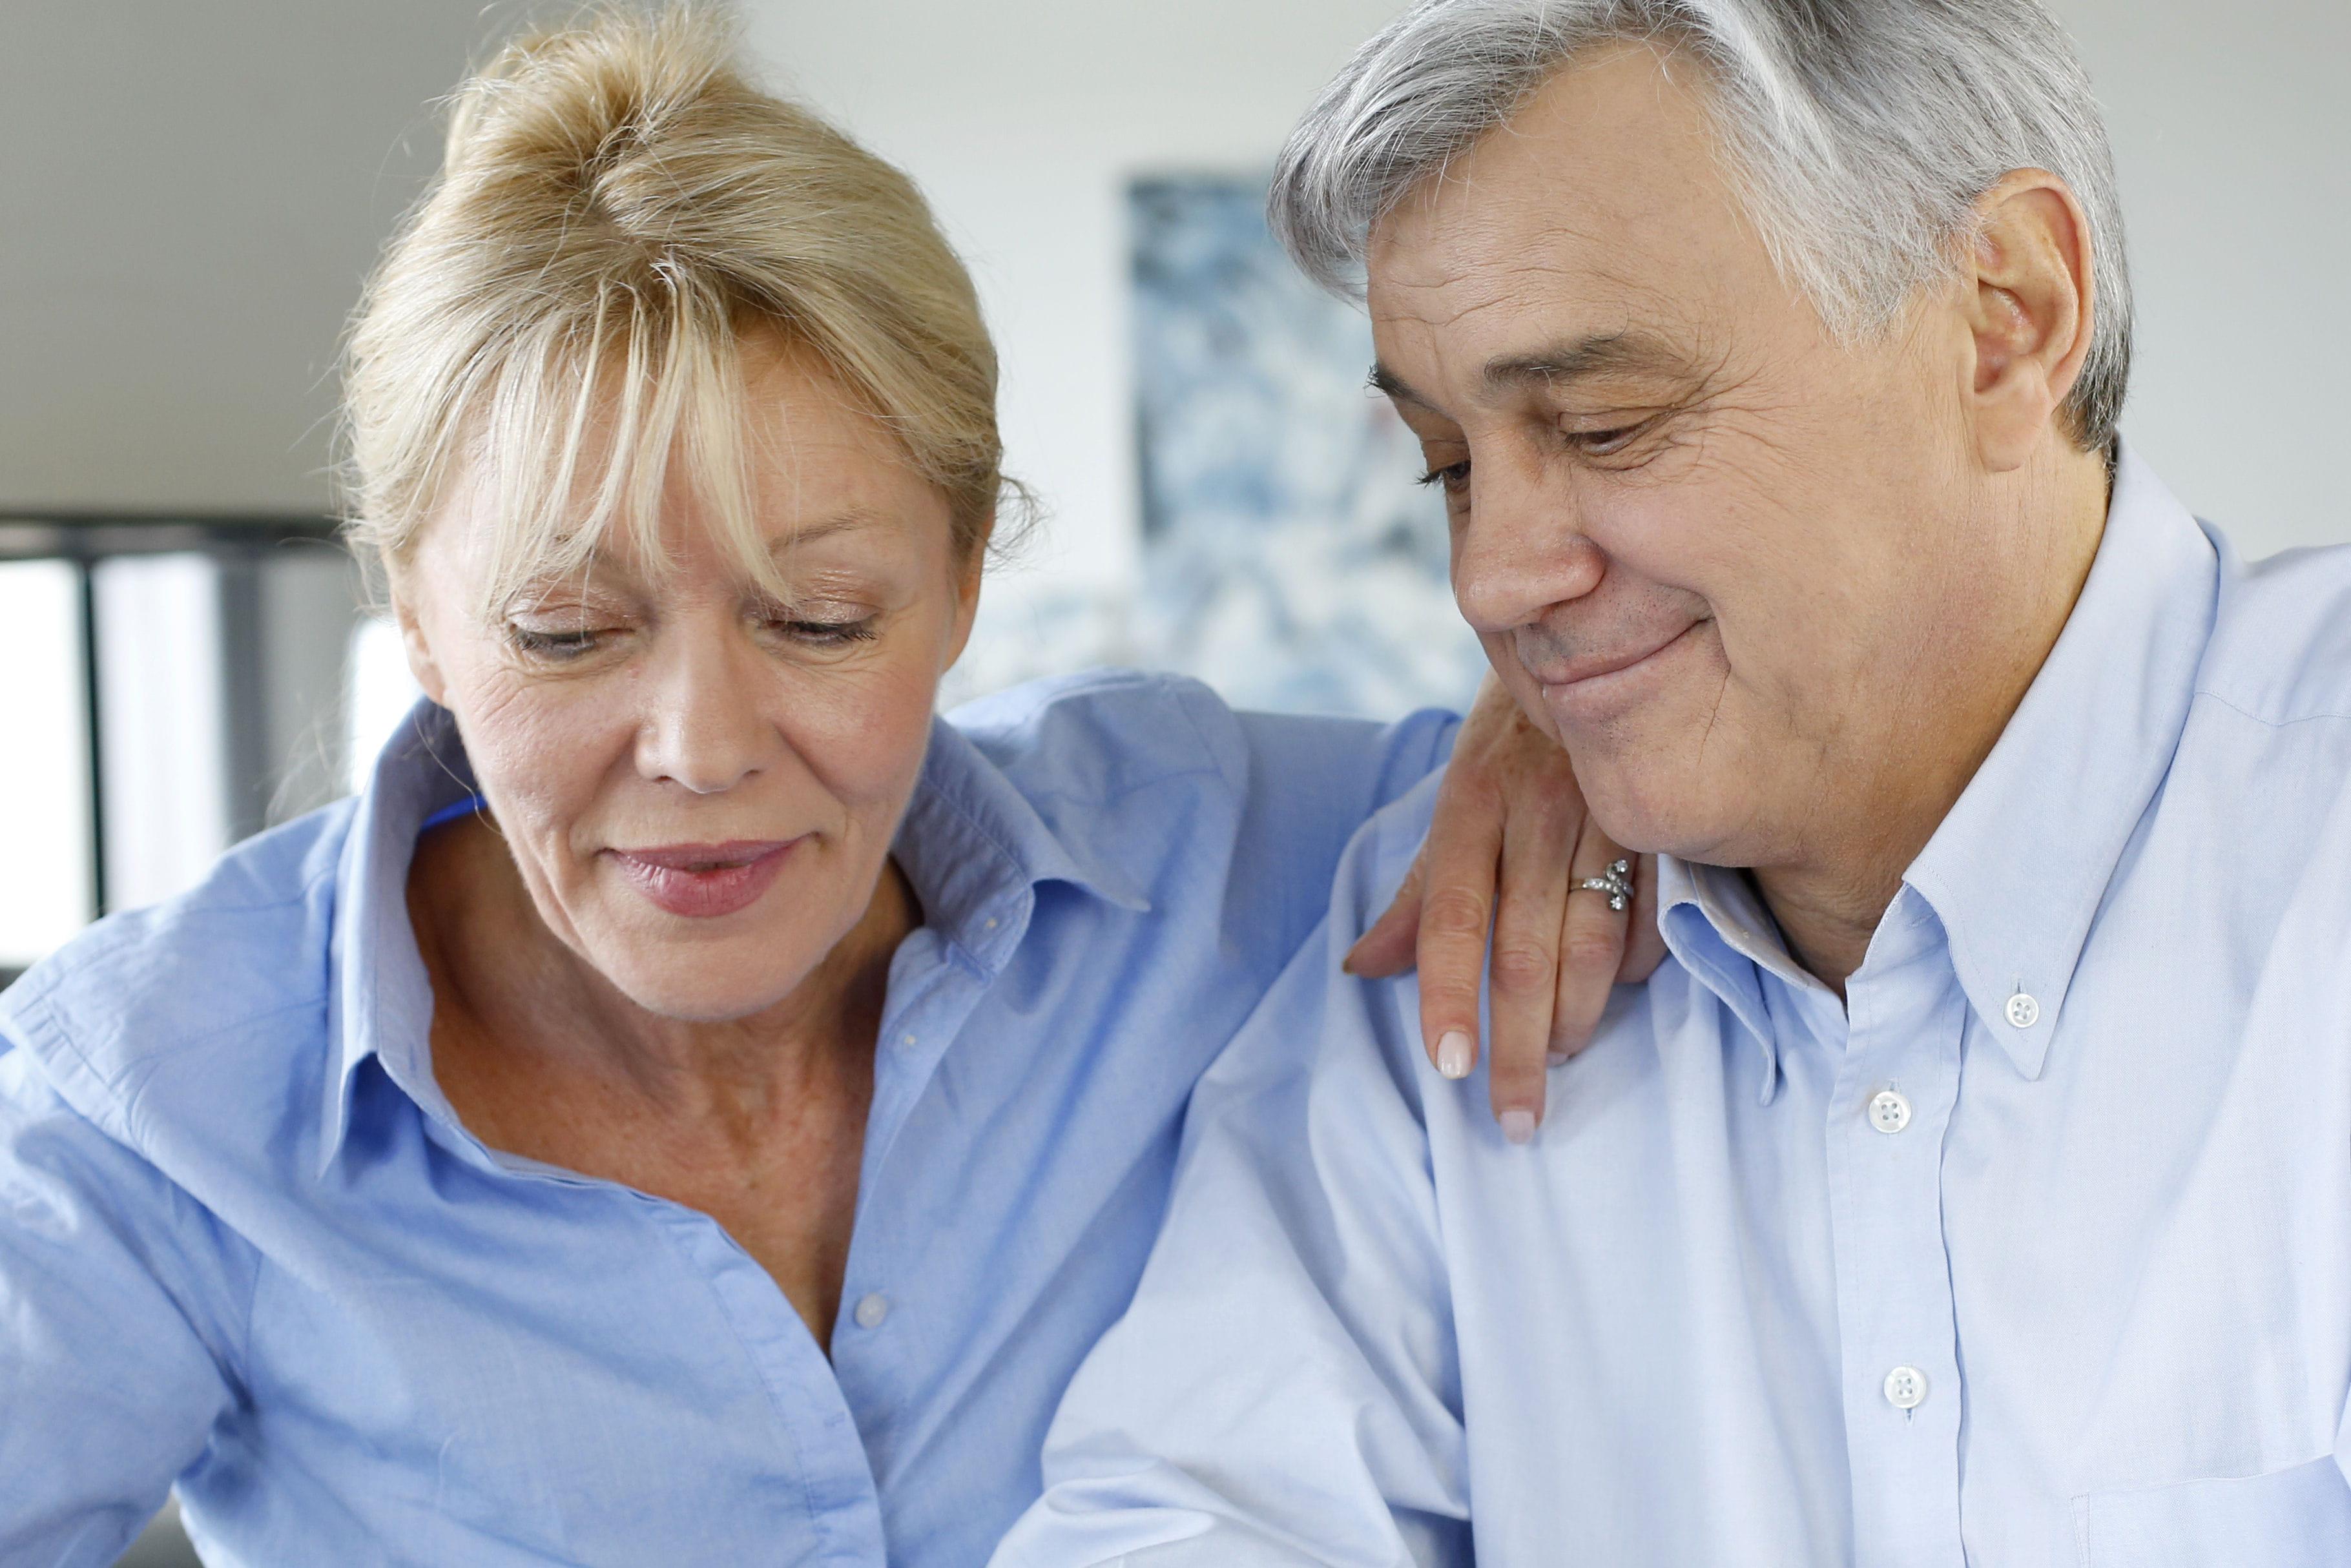 comment declarer indemnite depart retraite